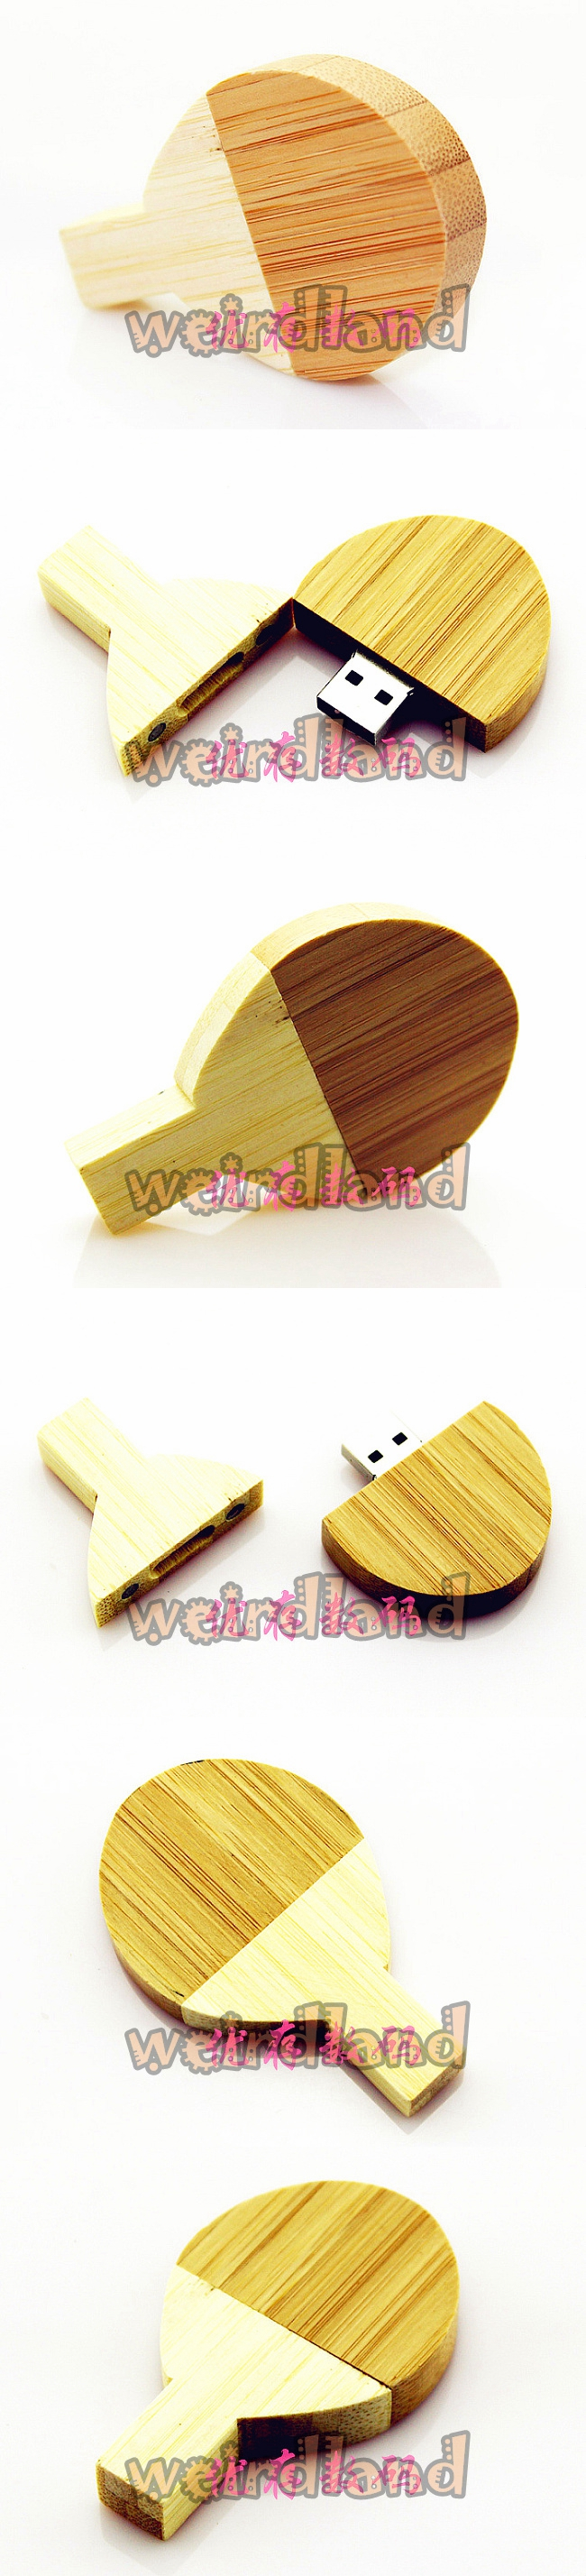 Cello USB Stick 8GB  3D USB Flash Drives WeirdLand